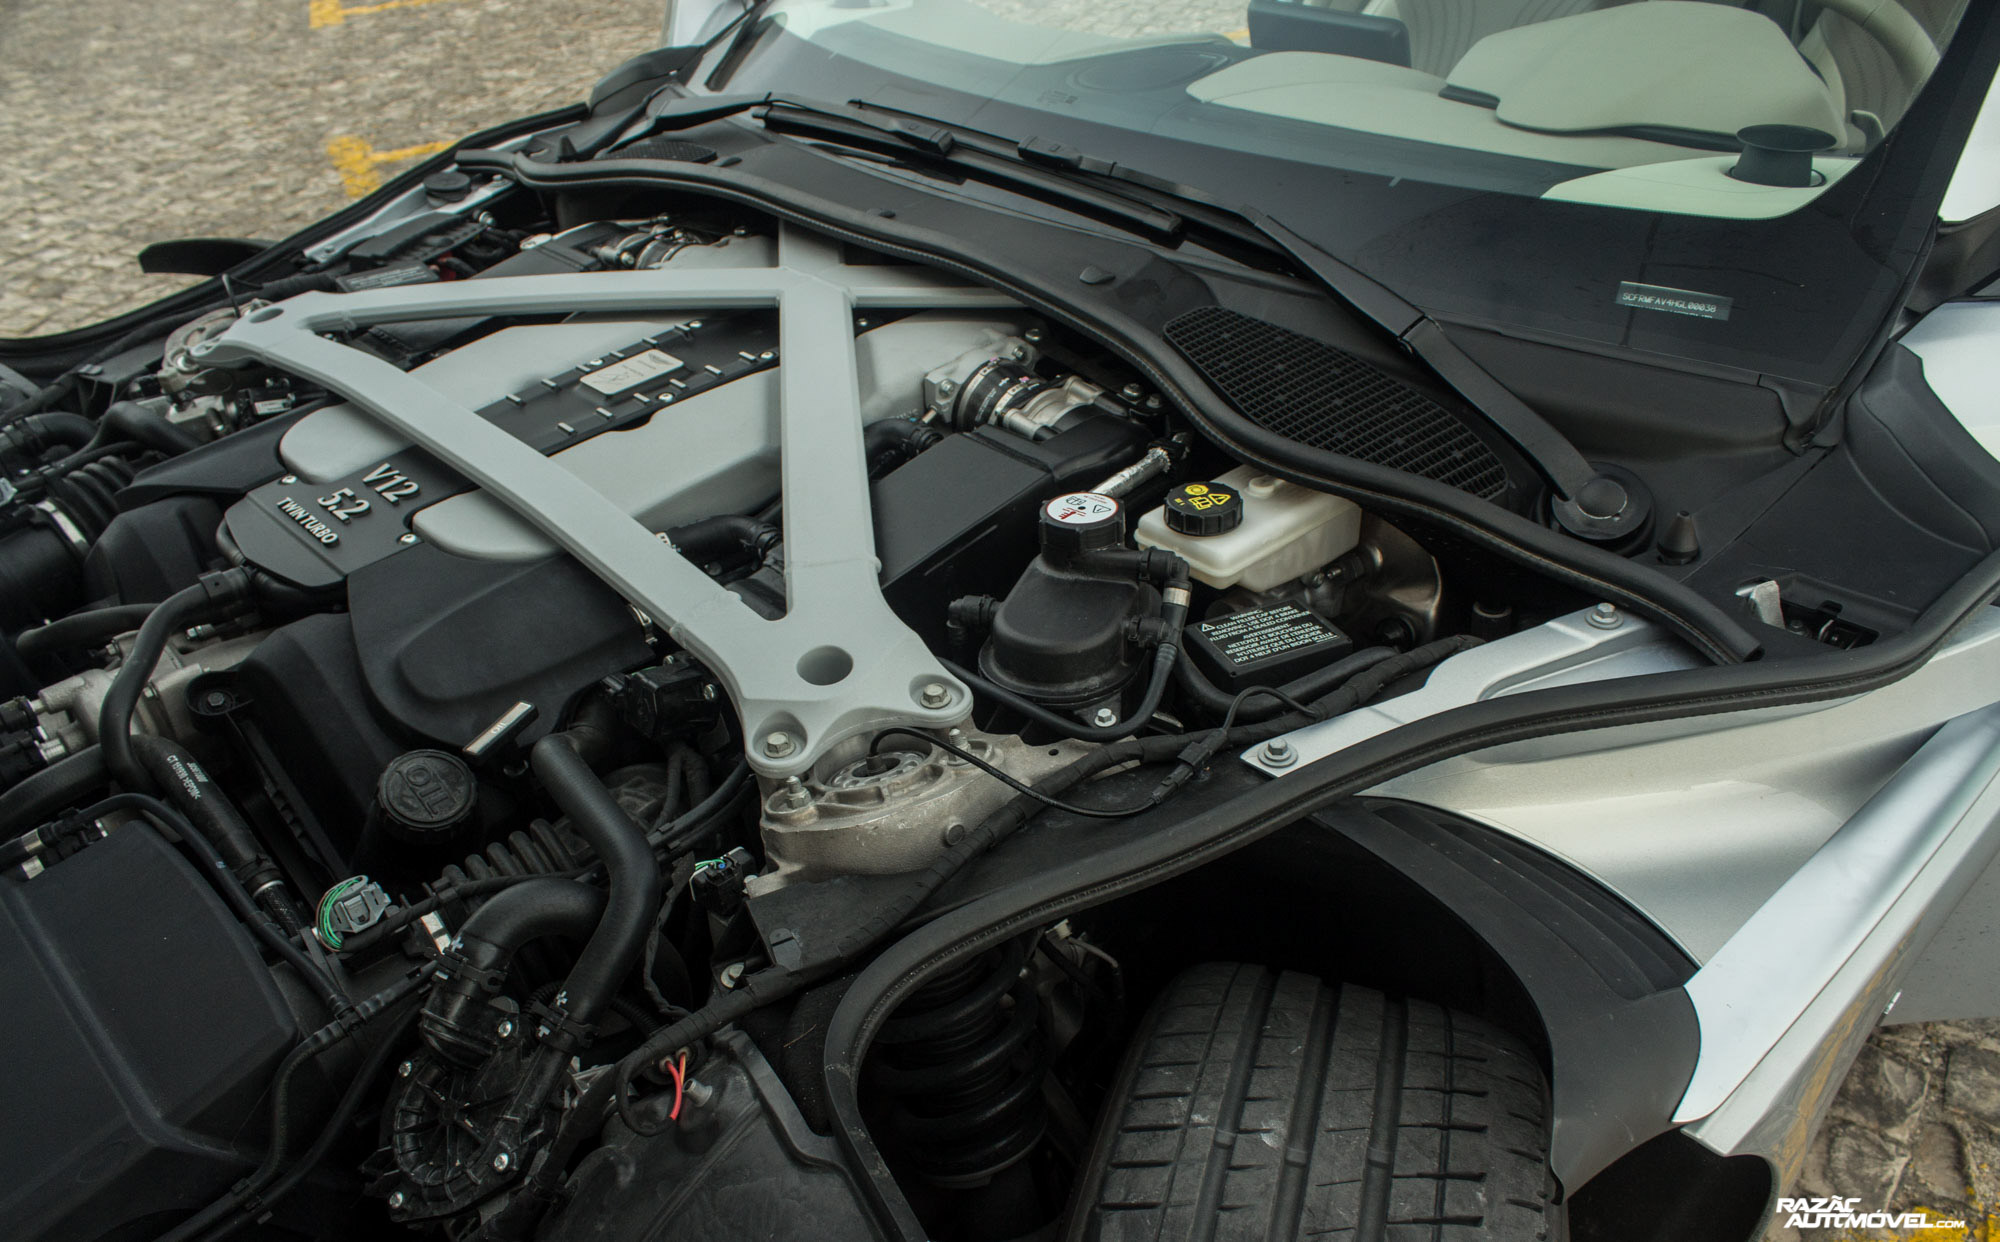 Aston Martin DB11 — V12 5.2